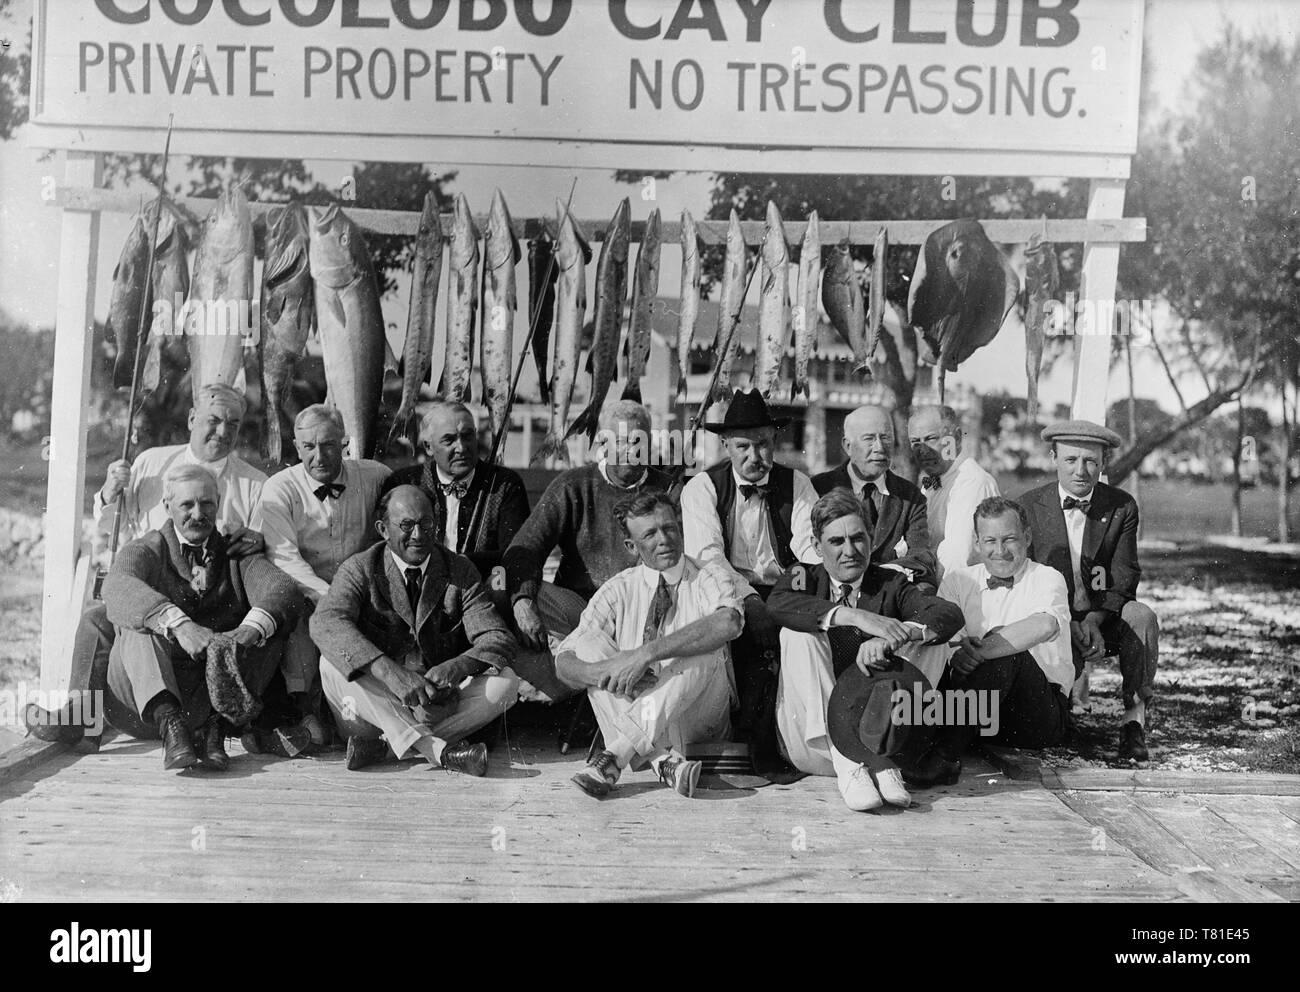 Warren Harding and group with fish at Cocolobo Cay Club, Adams Key, Florida, circa 1921 - Stock Image